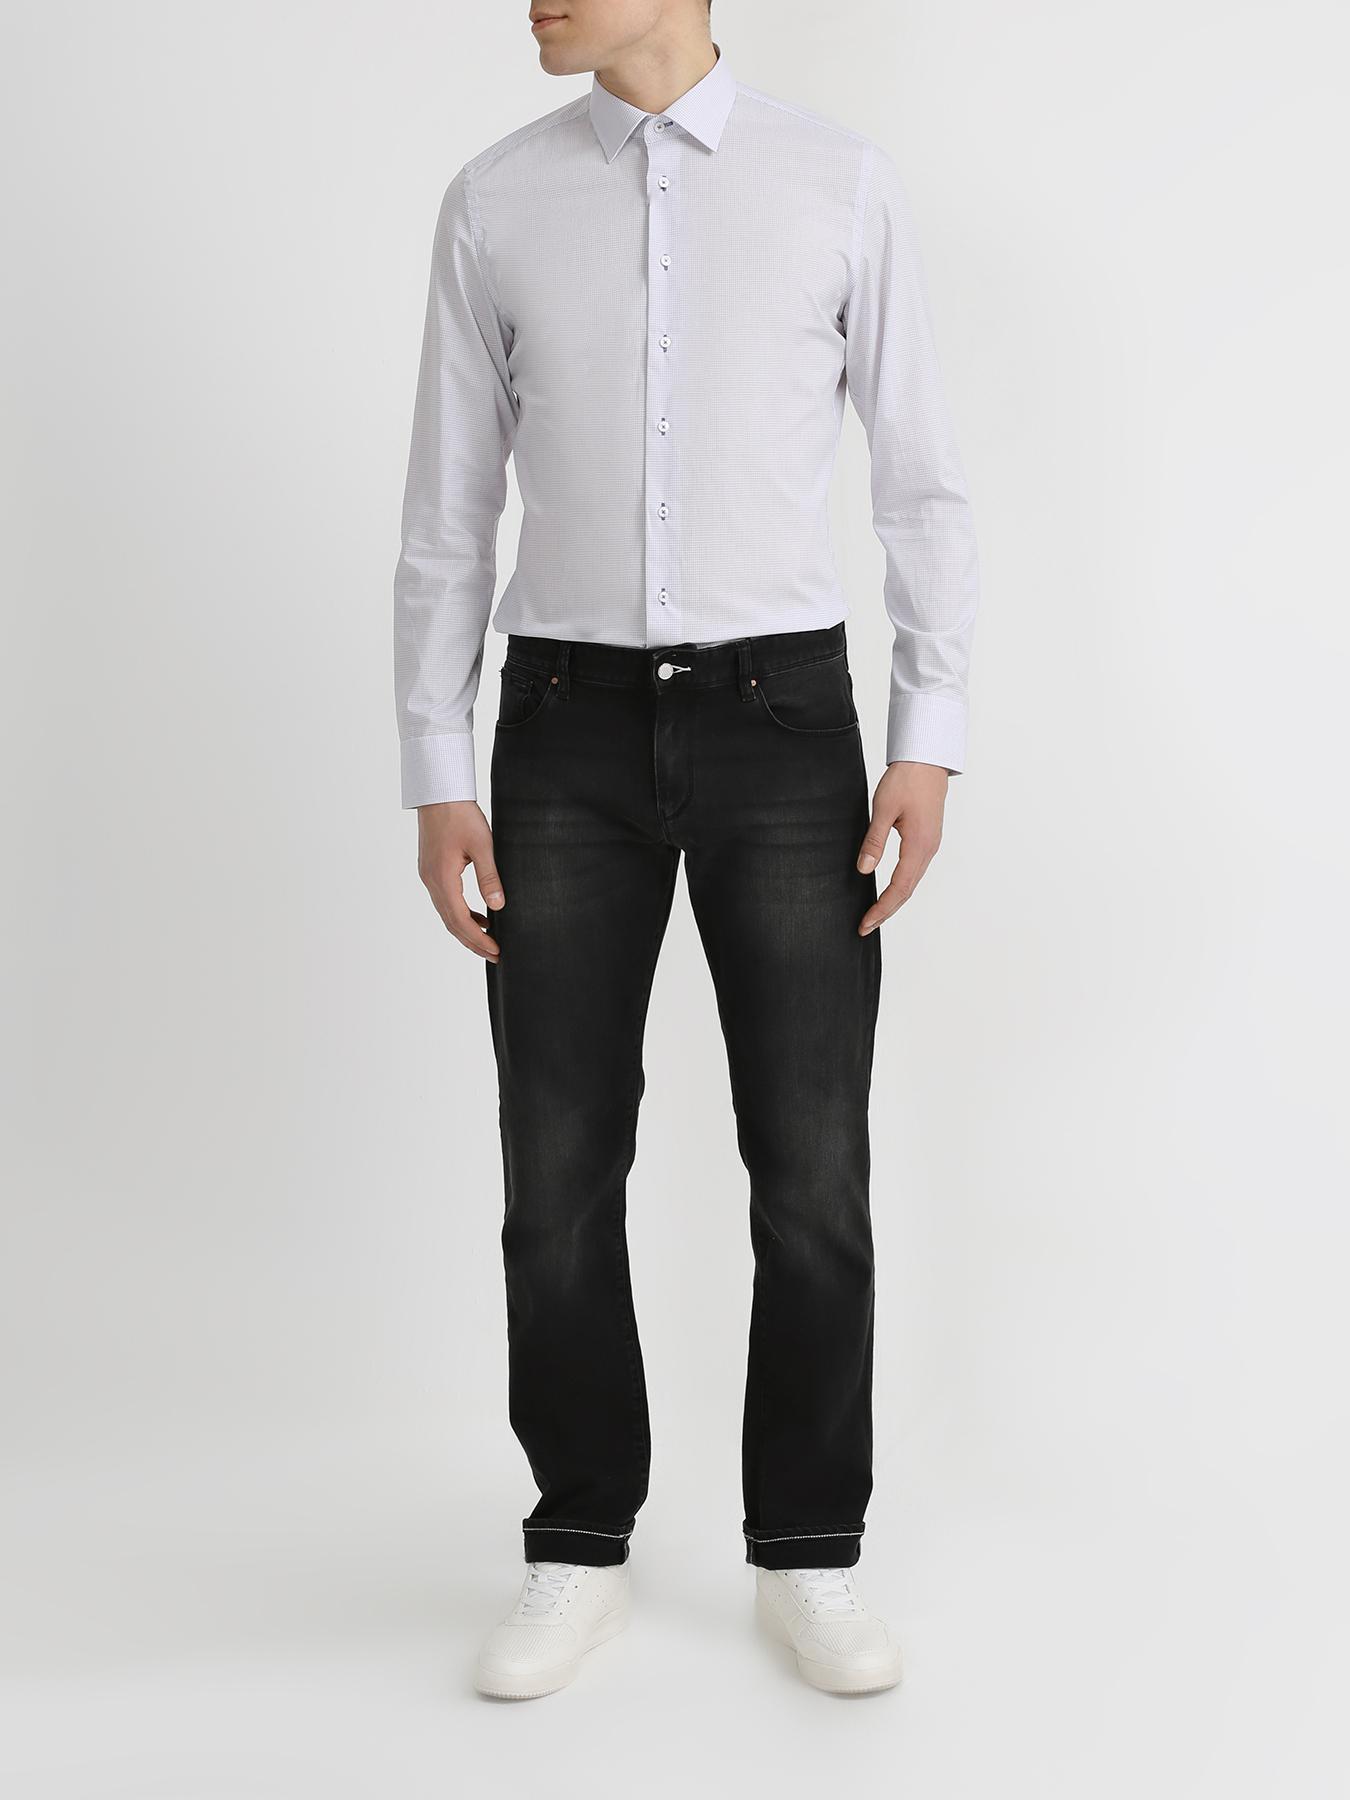 Рубашка Ritter Хлопковая рубашка в клетку